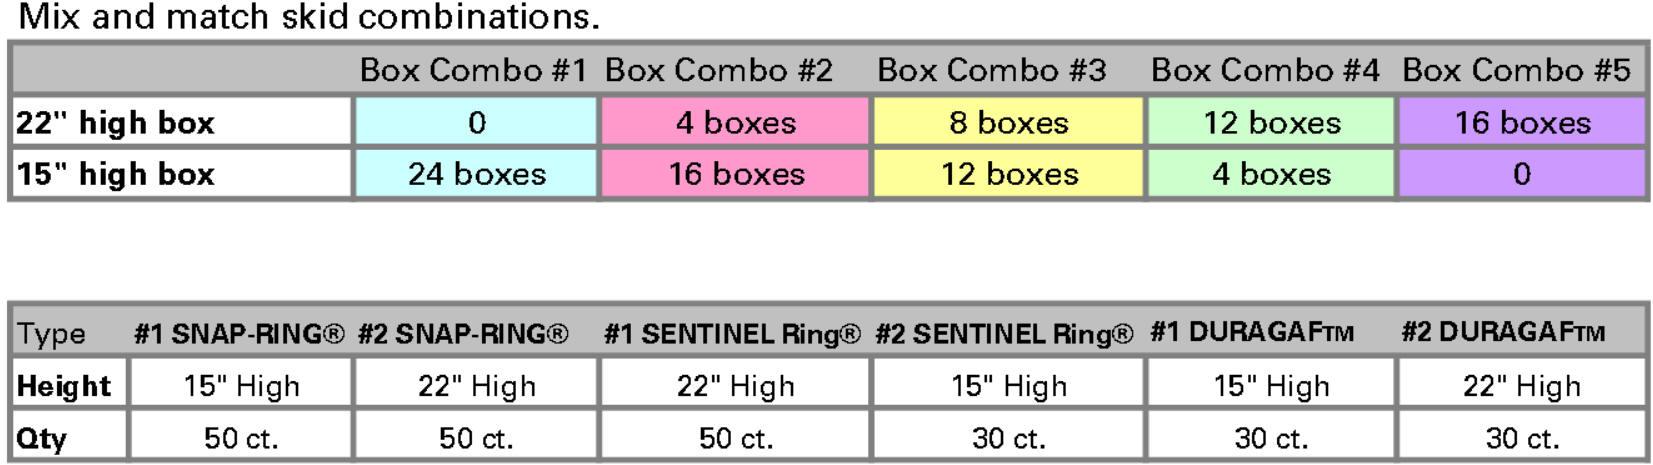 Eaton filter bag carton sizes